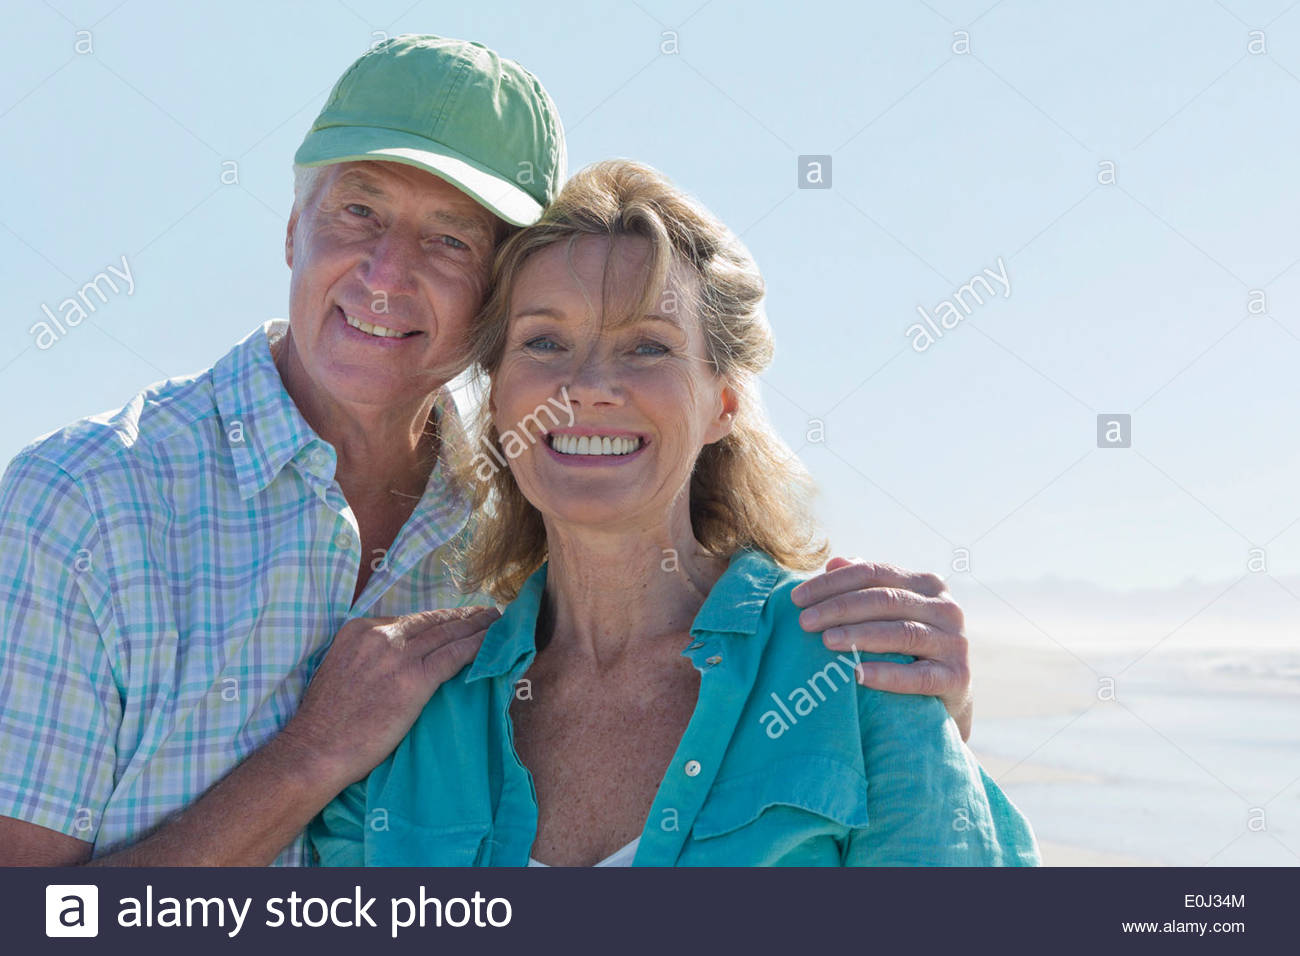 Close up portrait of smiling senior couple on sunny beach - Stock Image